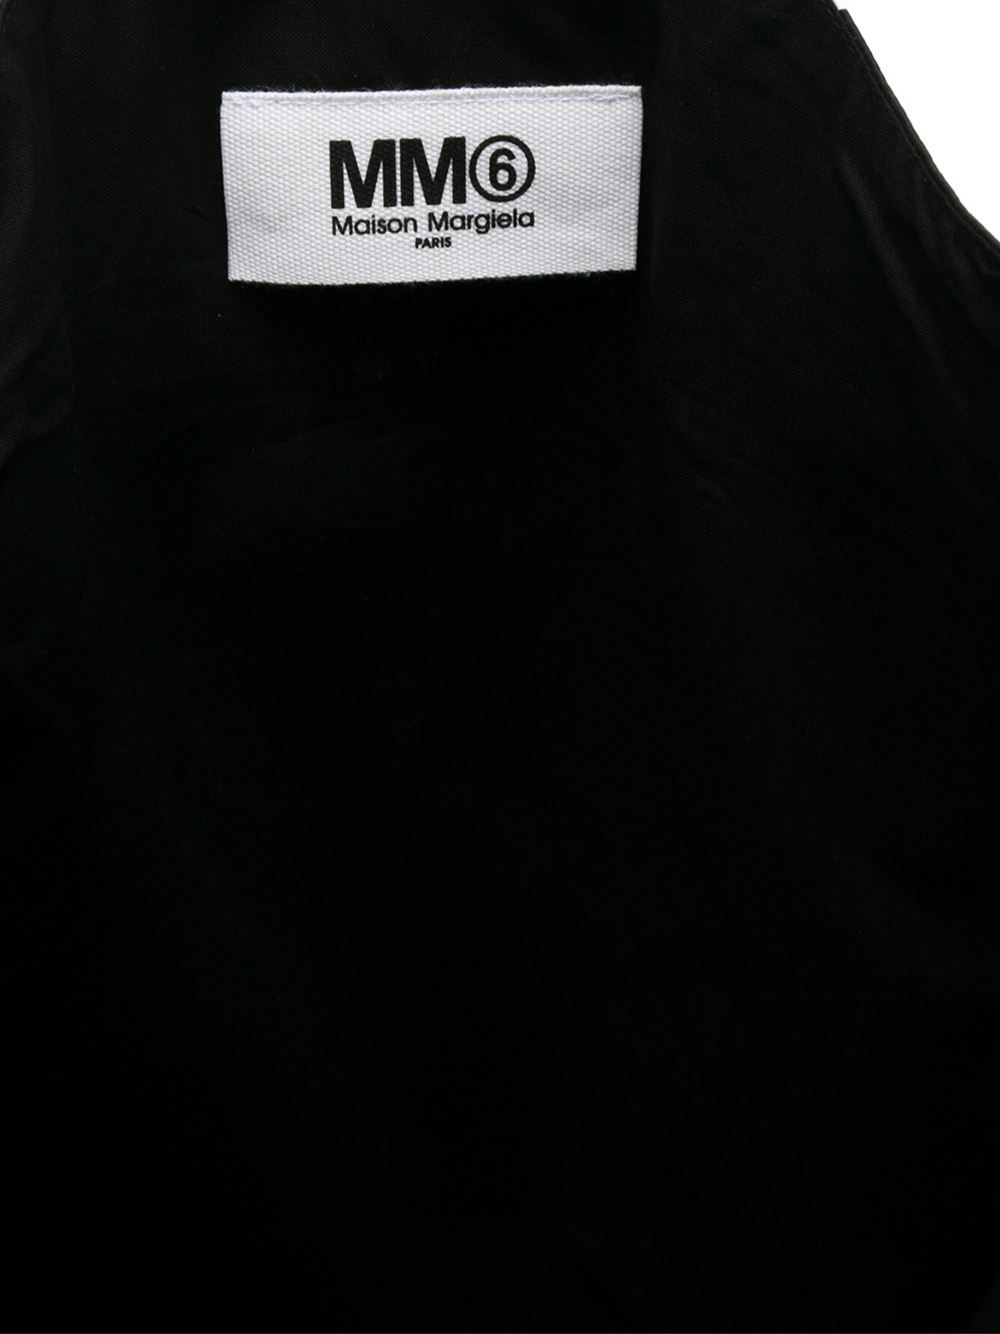 MM6 by Maison Martin Margiela Cotton Paint Splash Print Tote in Black